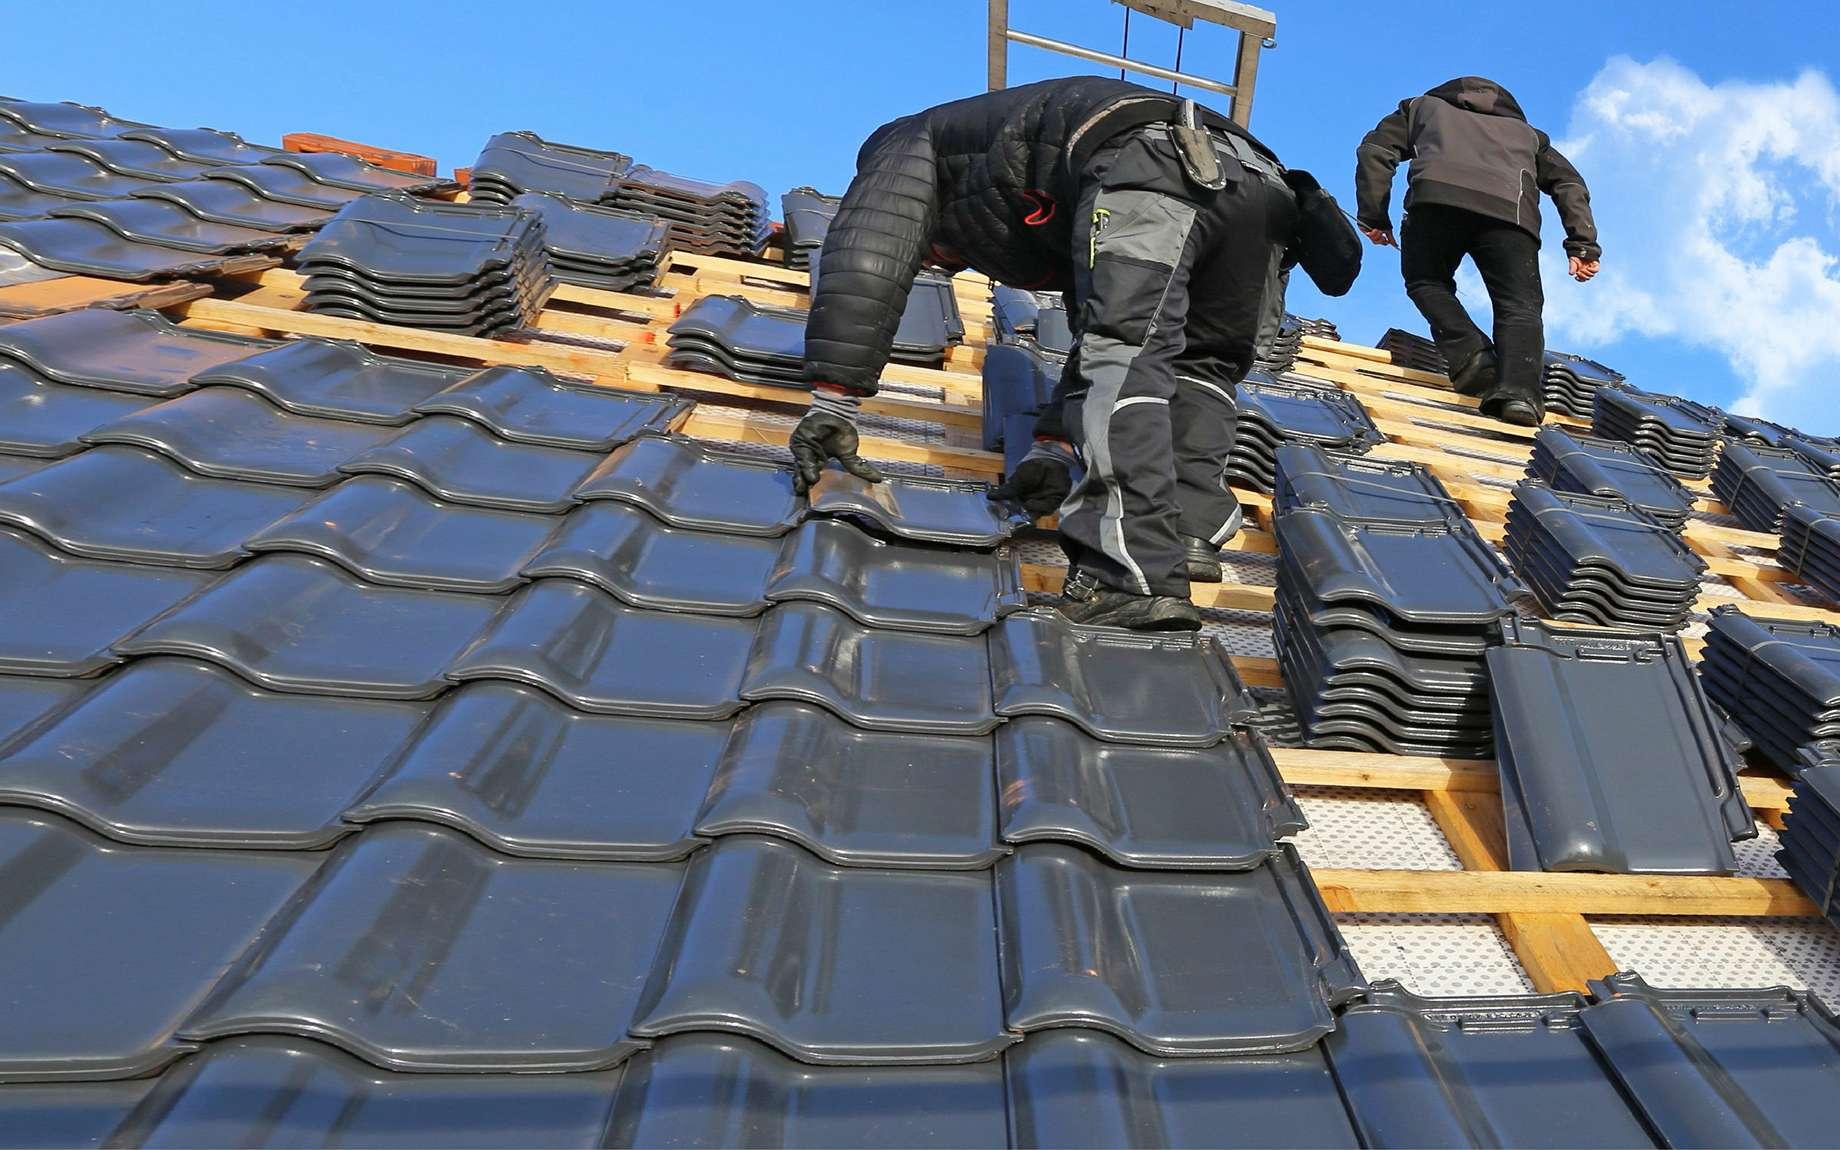 Travaux de pose d'une toiture neuve © U.J.Alexander, AdobeStock